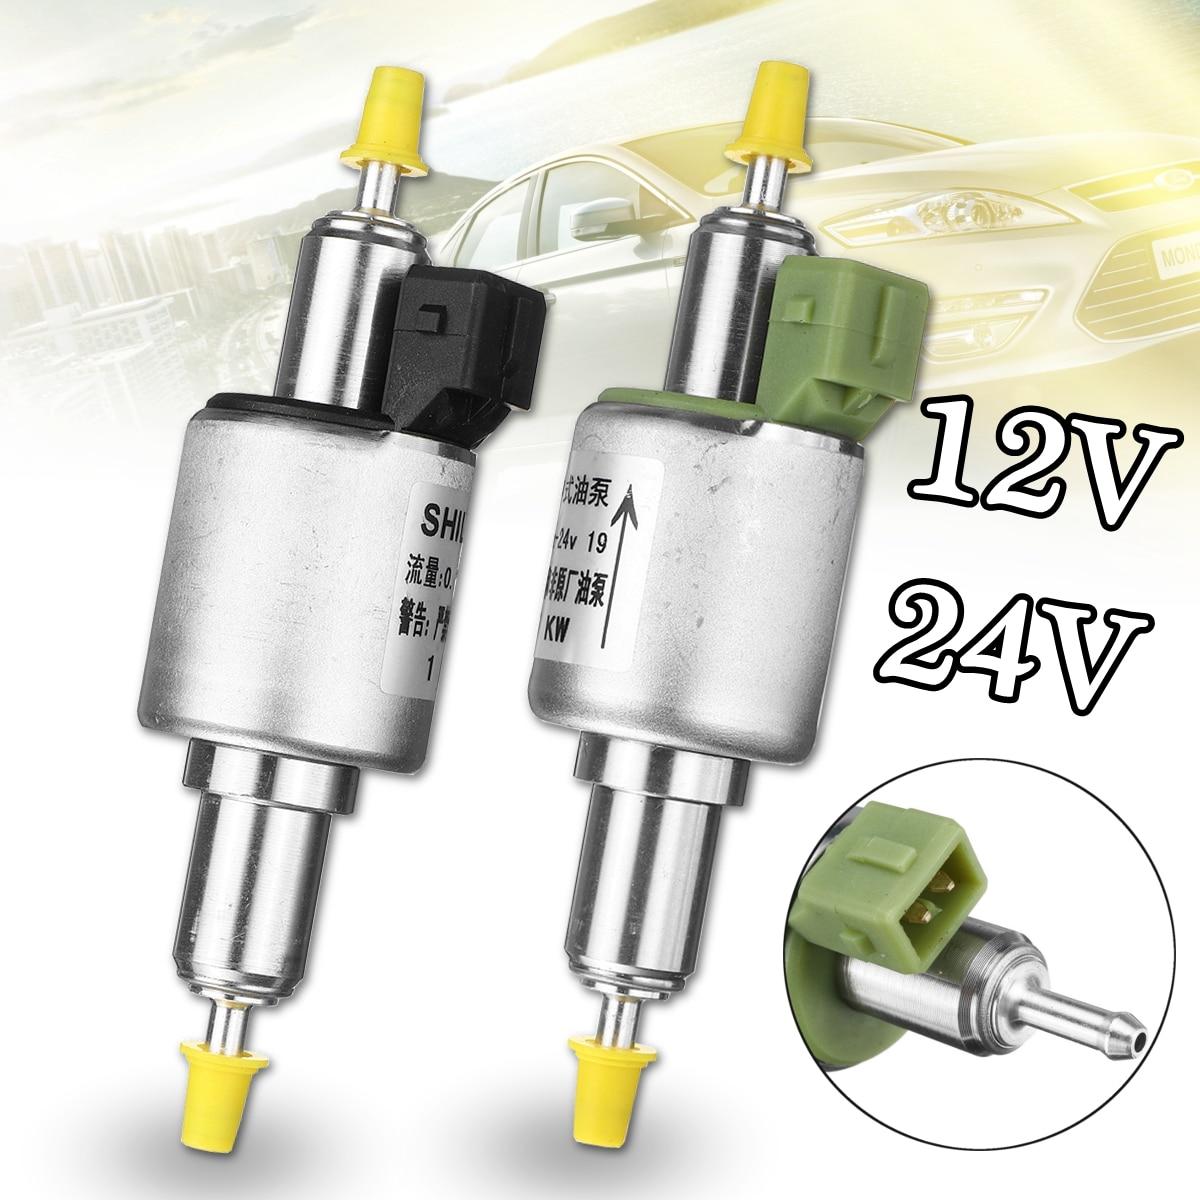 12V/24V 1000W- 5000W Universal Car  Heater Oil Fuel Diesel Pump Air Parking Heater Car Styling Accessories